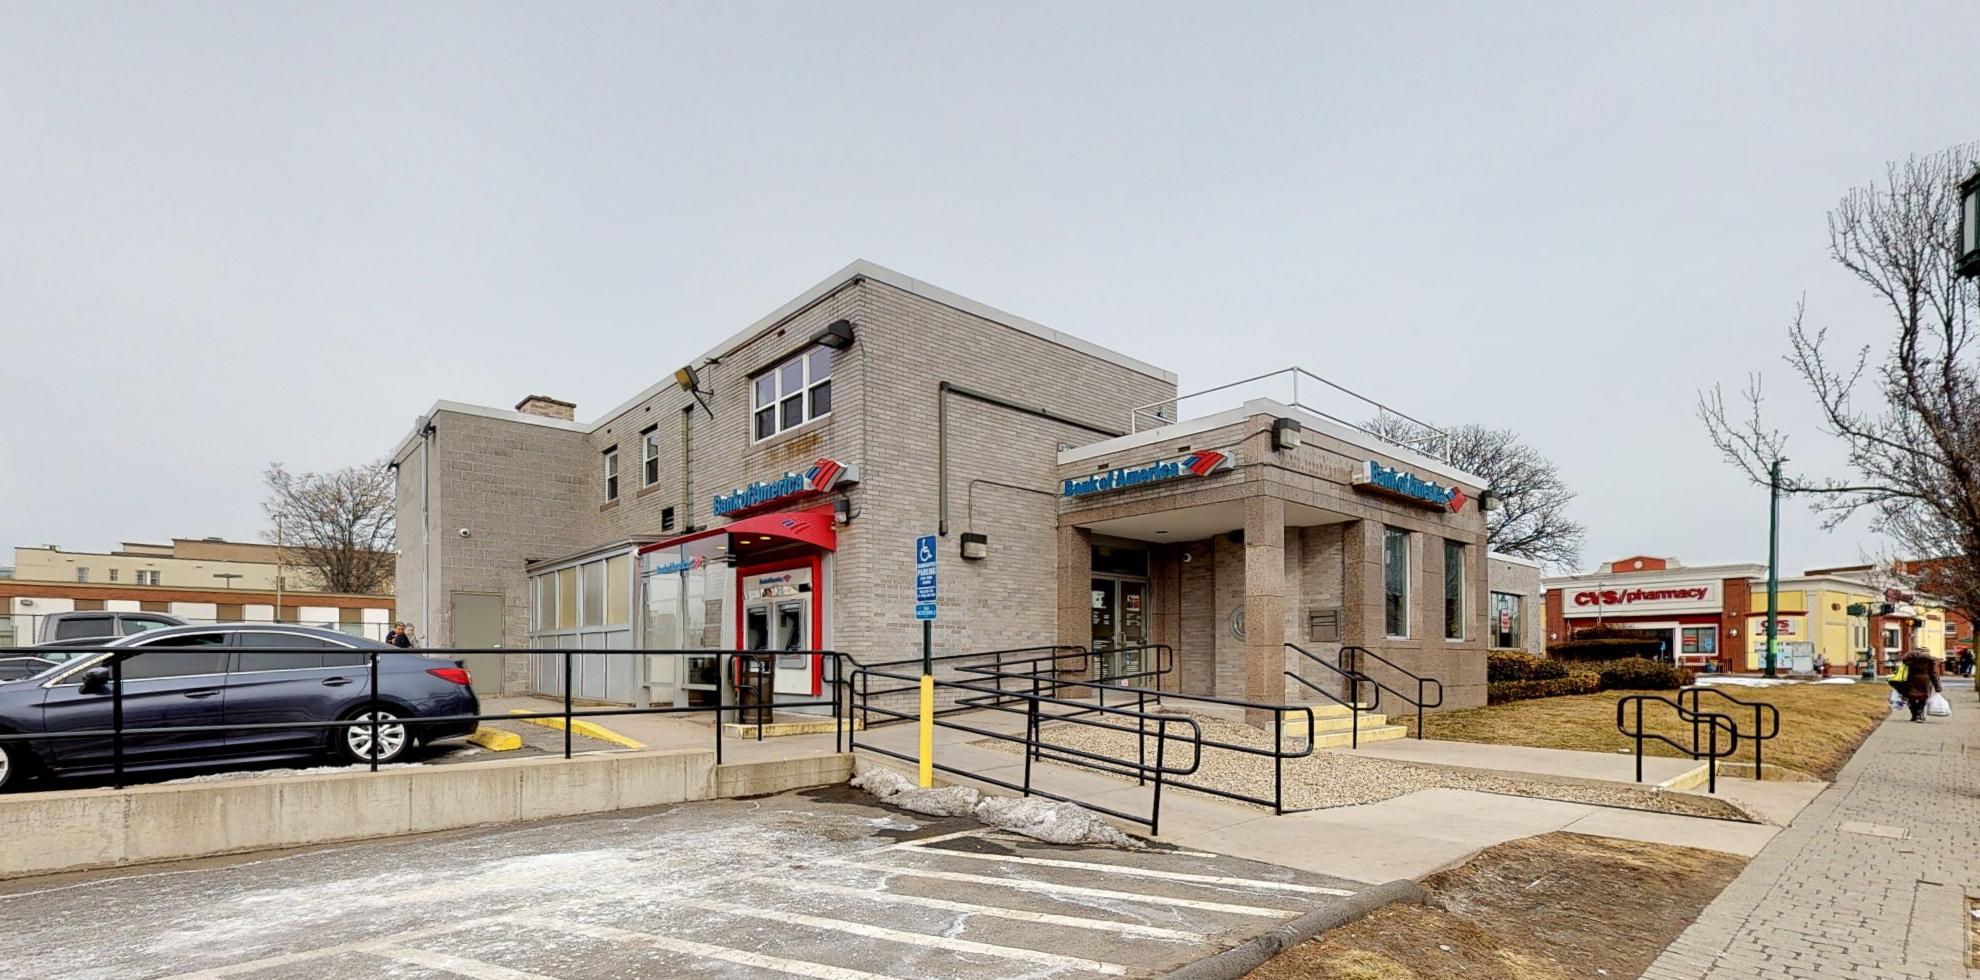 Bank of America financial center with drive-thru ATM | 147 Washington St, Hartford, CT 06106